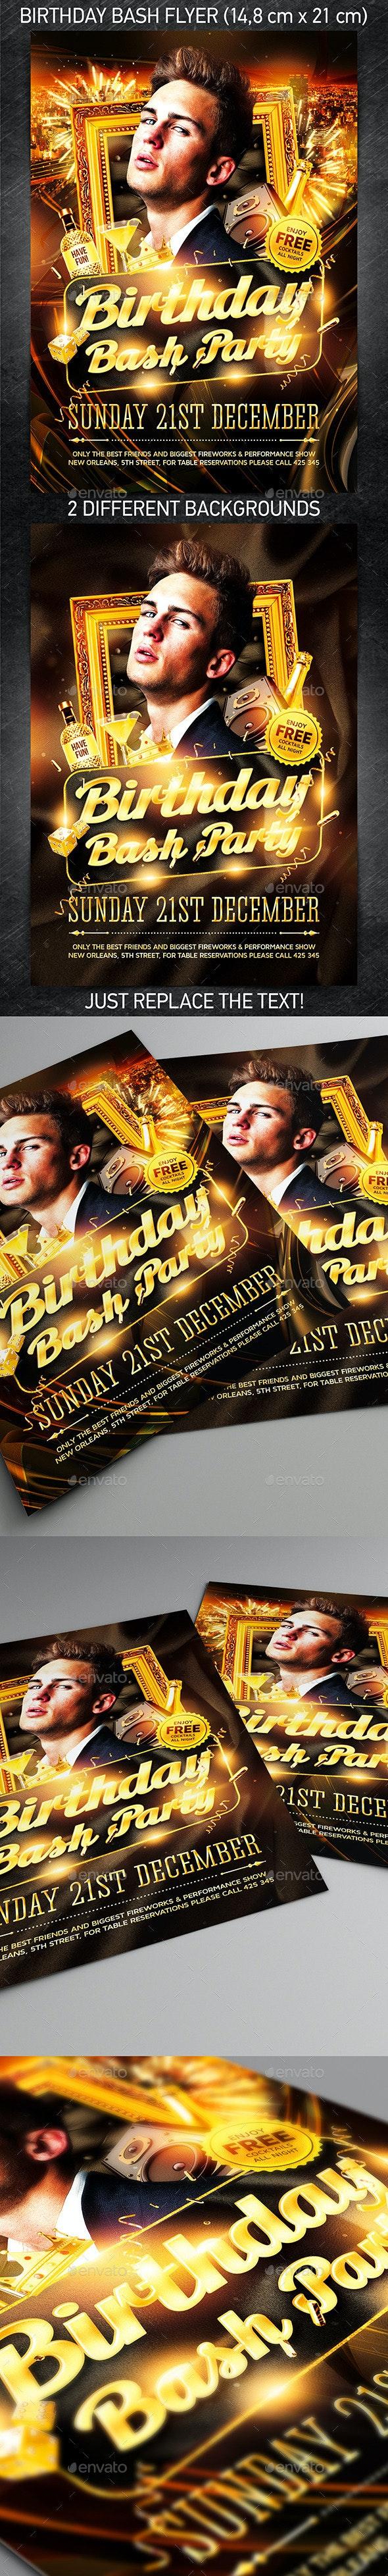 Birthday Bash Party Flyer - Flyers Print Templates